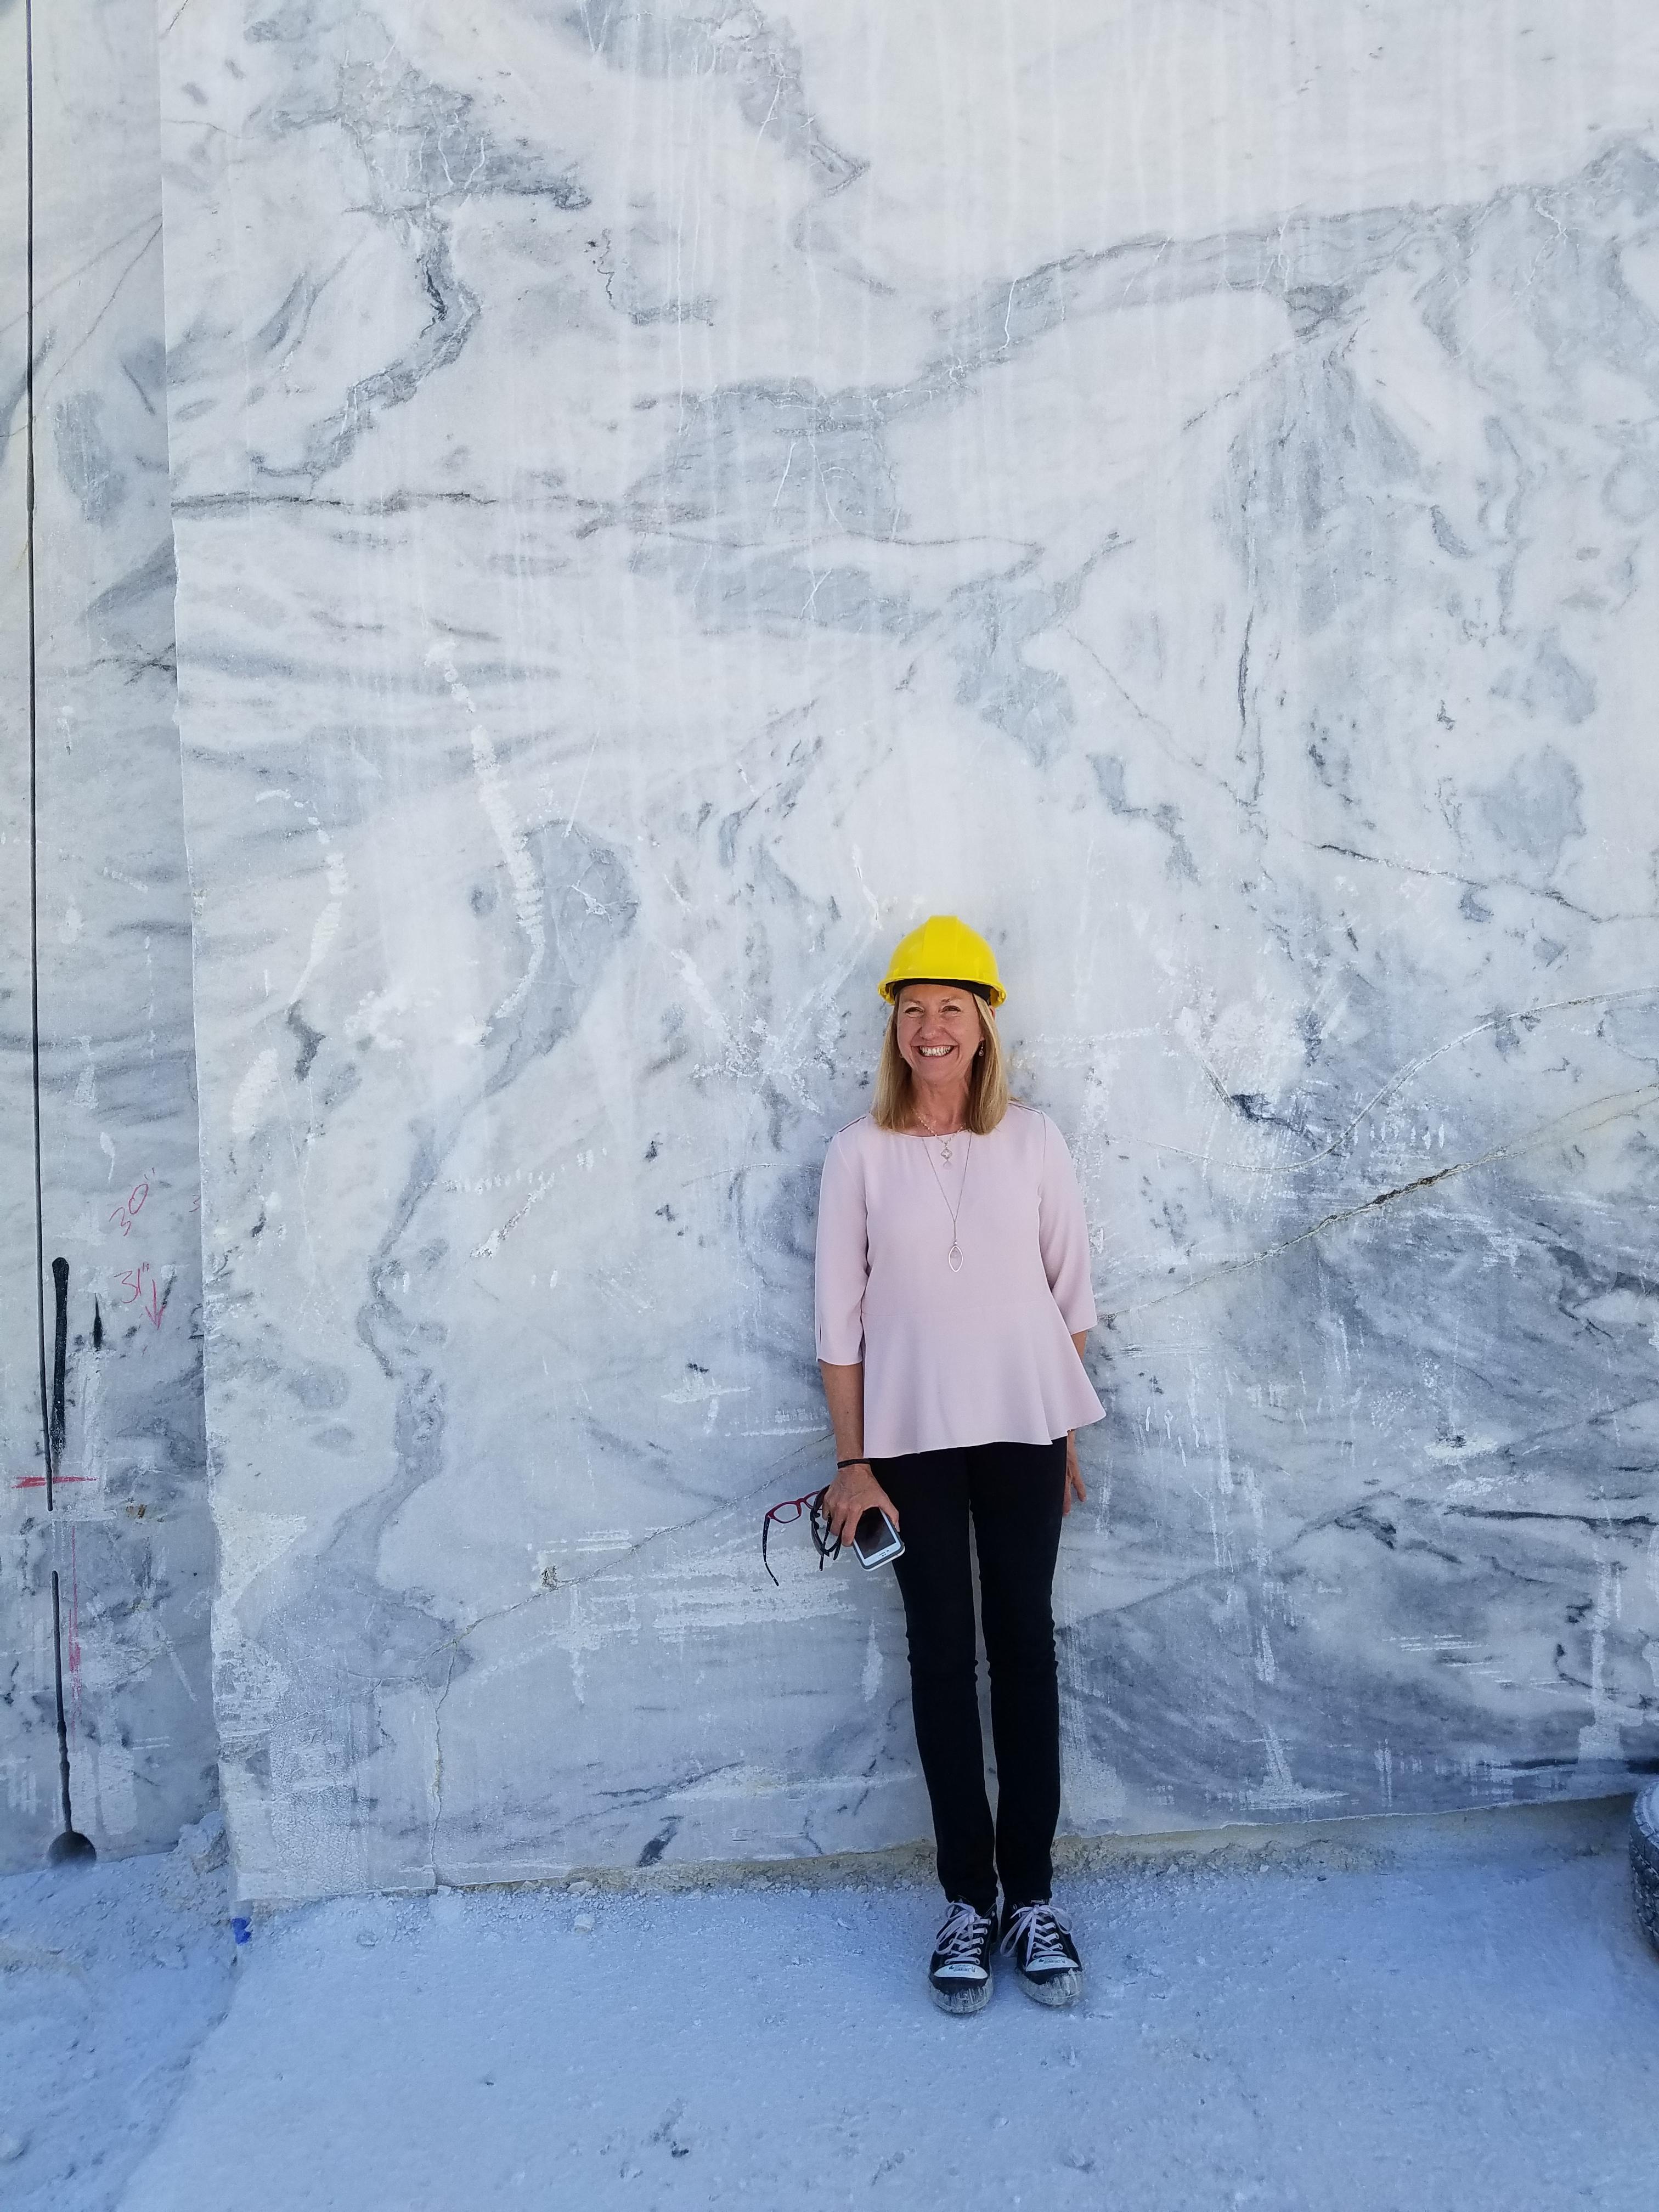 Inside Look: Winning Designers Visit Georgia Marble Quarry